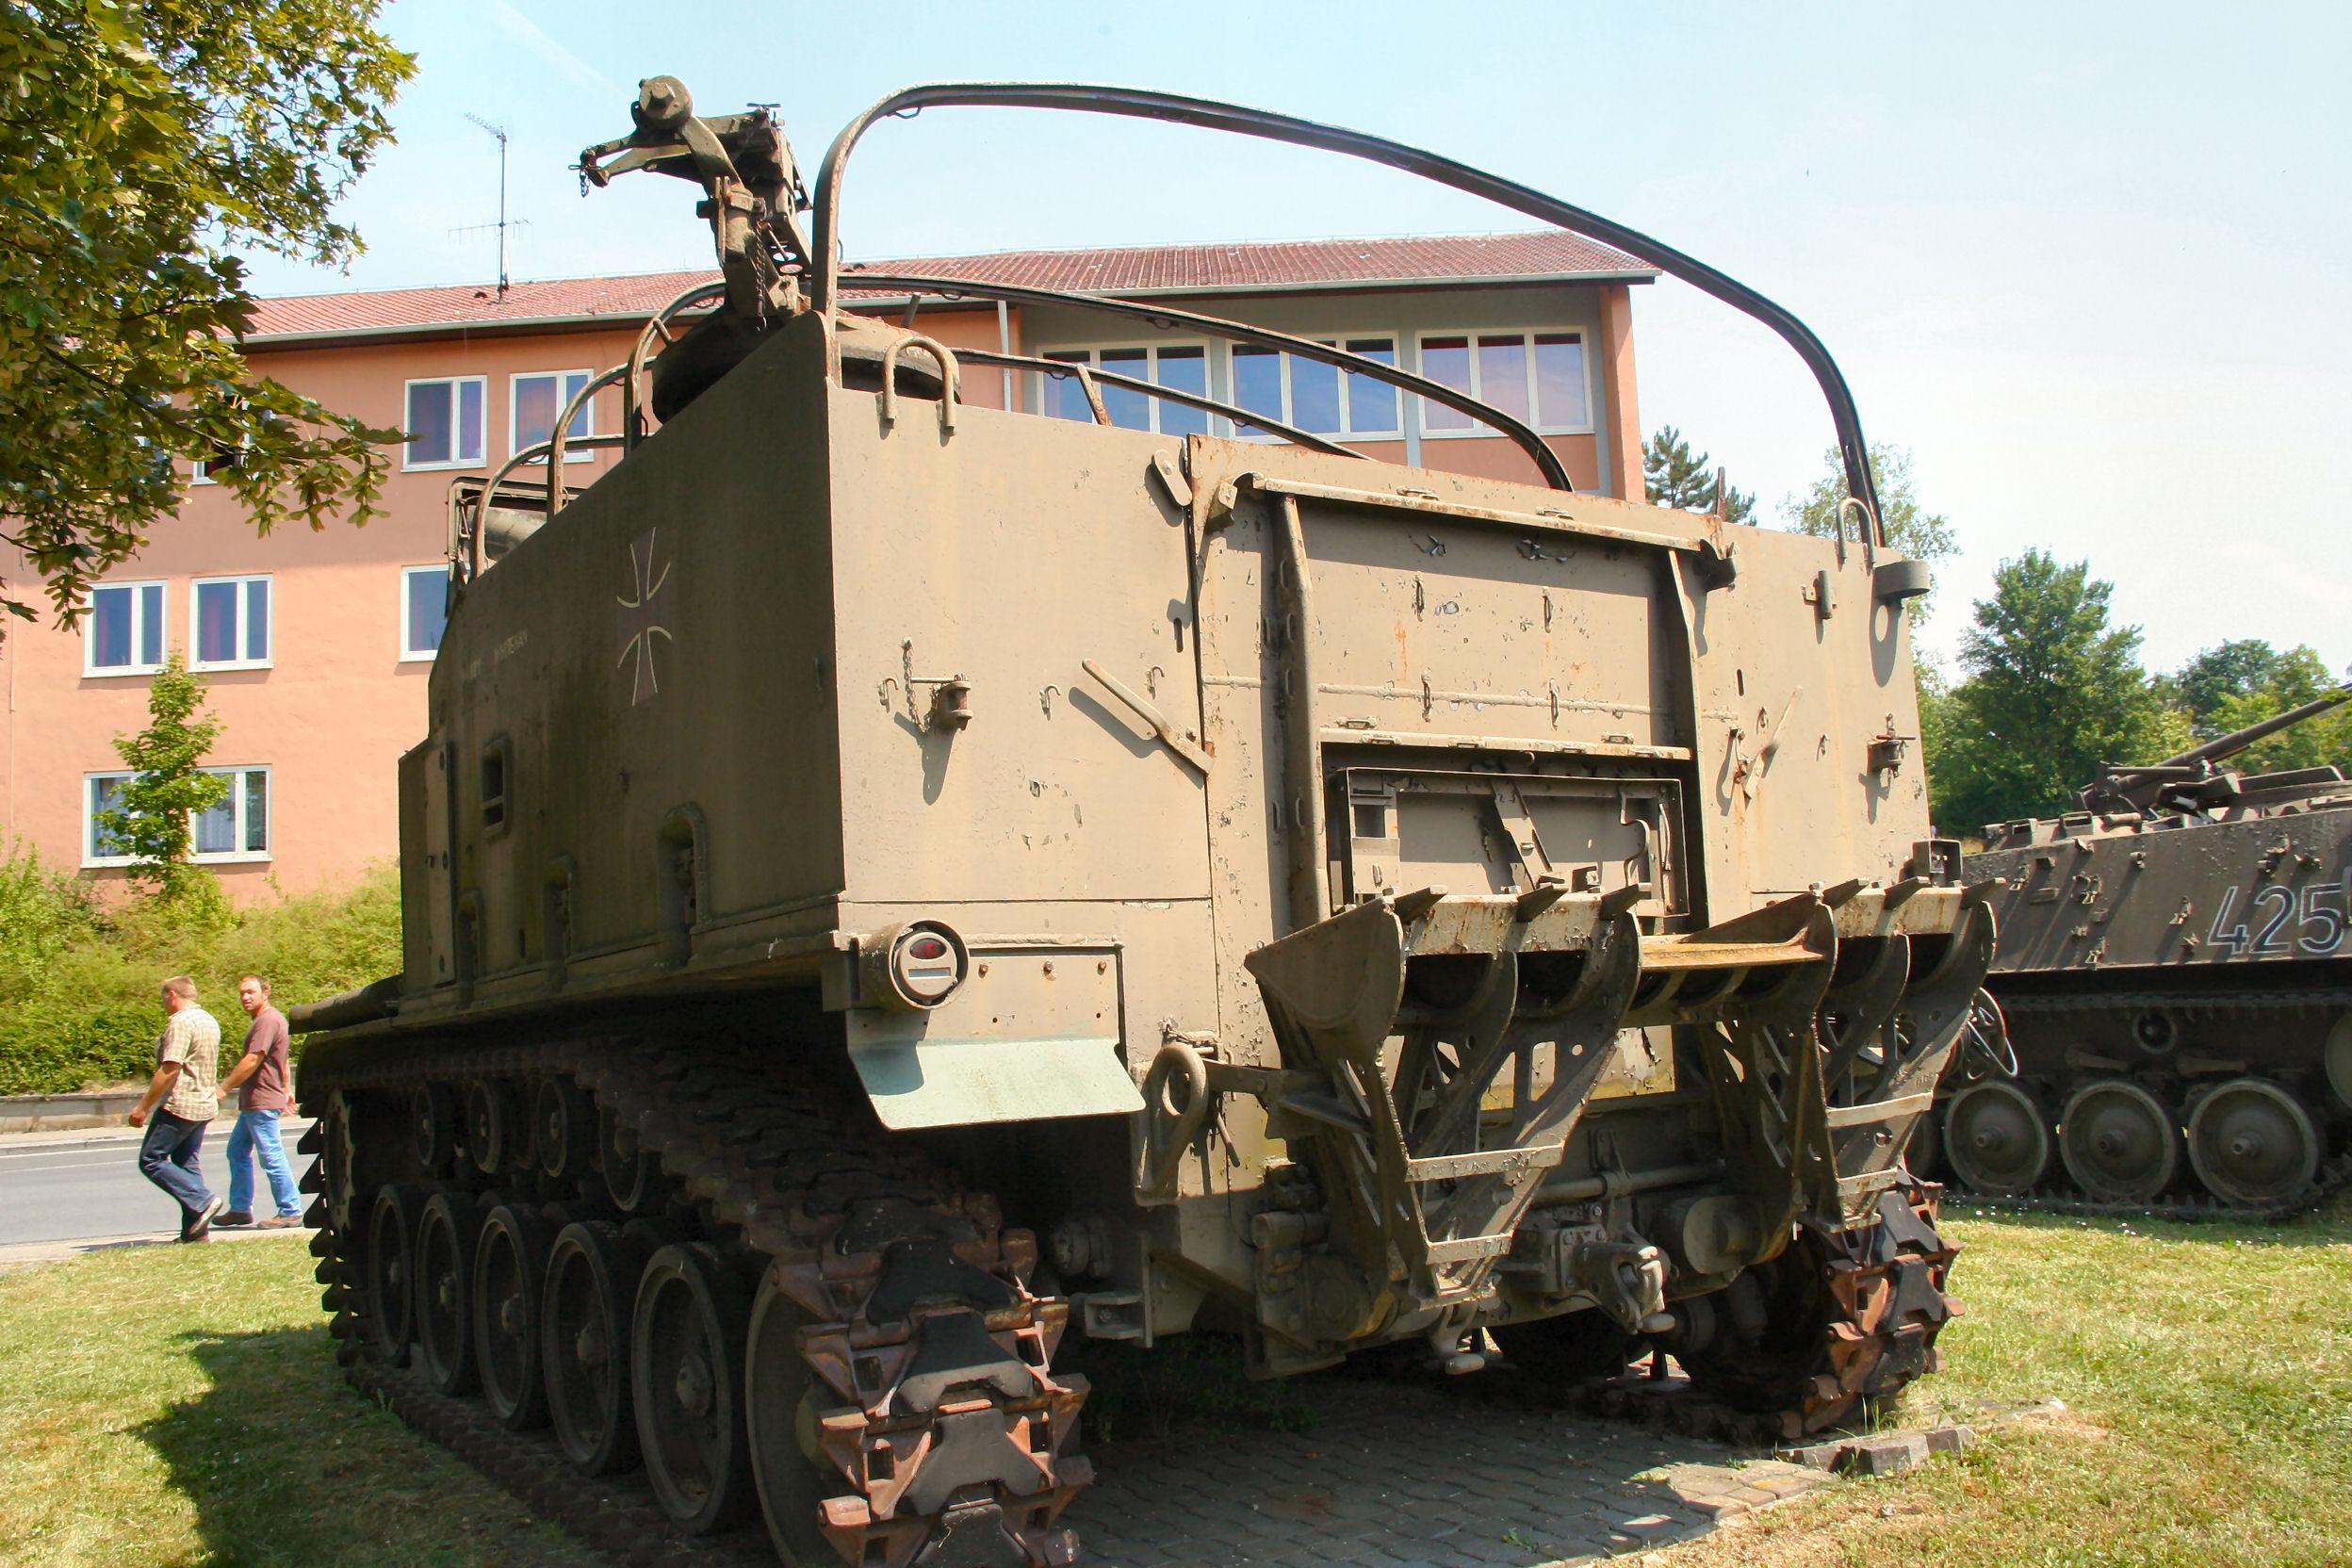 World Of Tanks : M44 SPG - Sand River (3 Kills) - YouTube